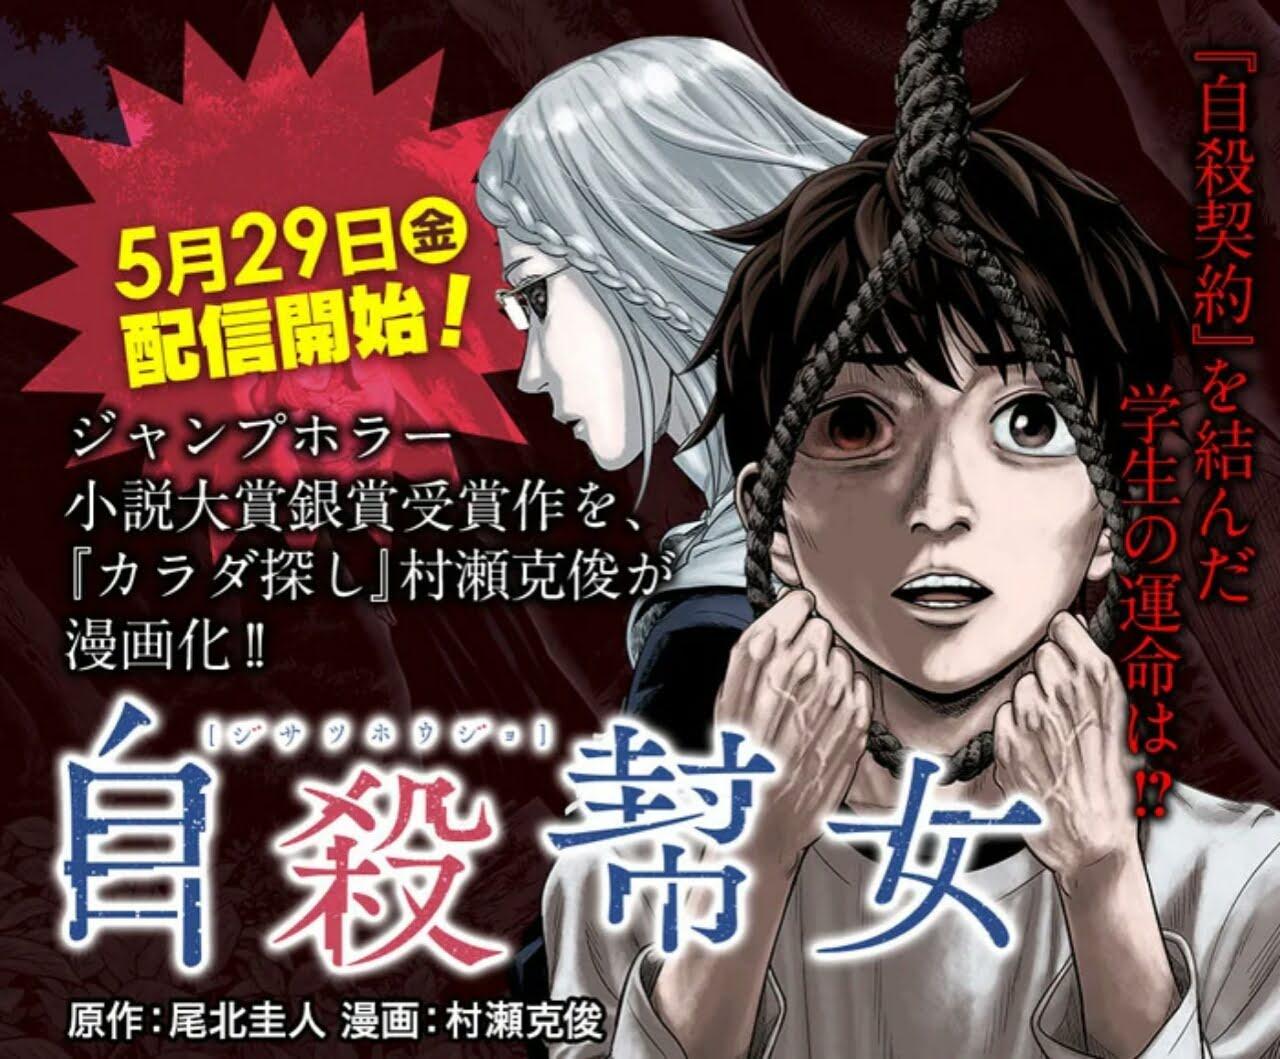 Katsutoshi Murase Akan Meluncurkan Manga Horror Baru 1